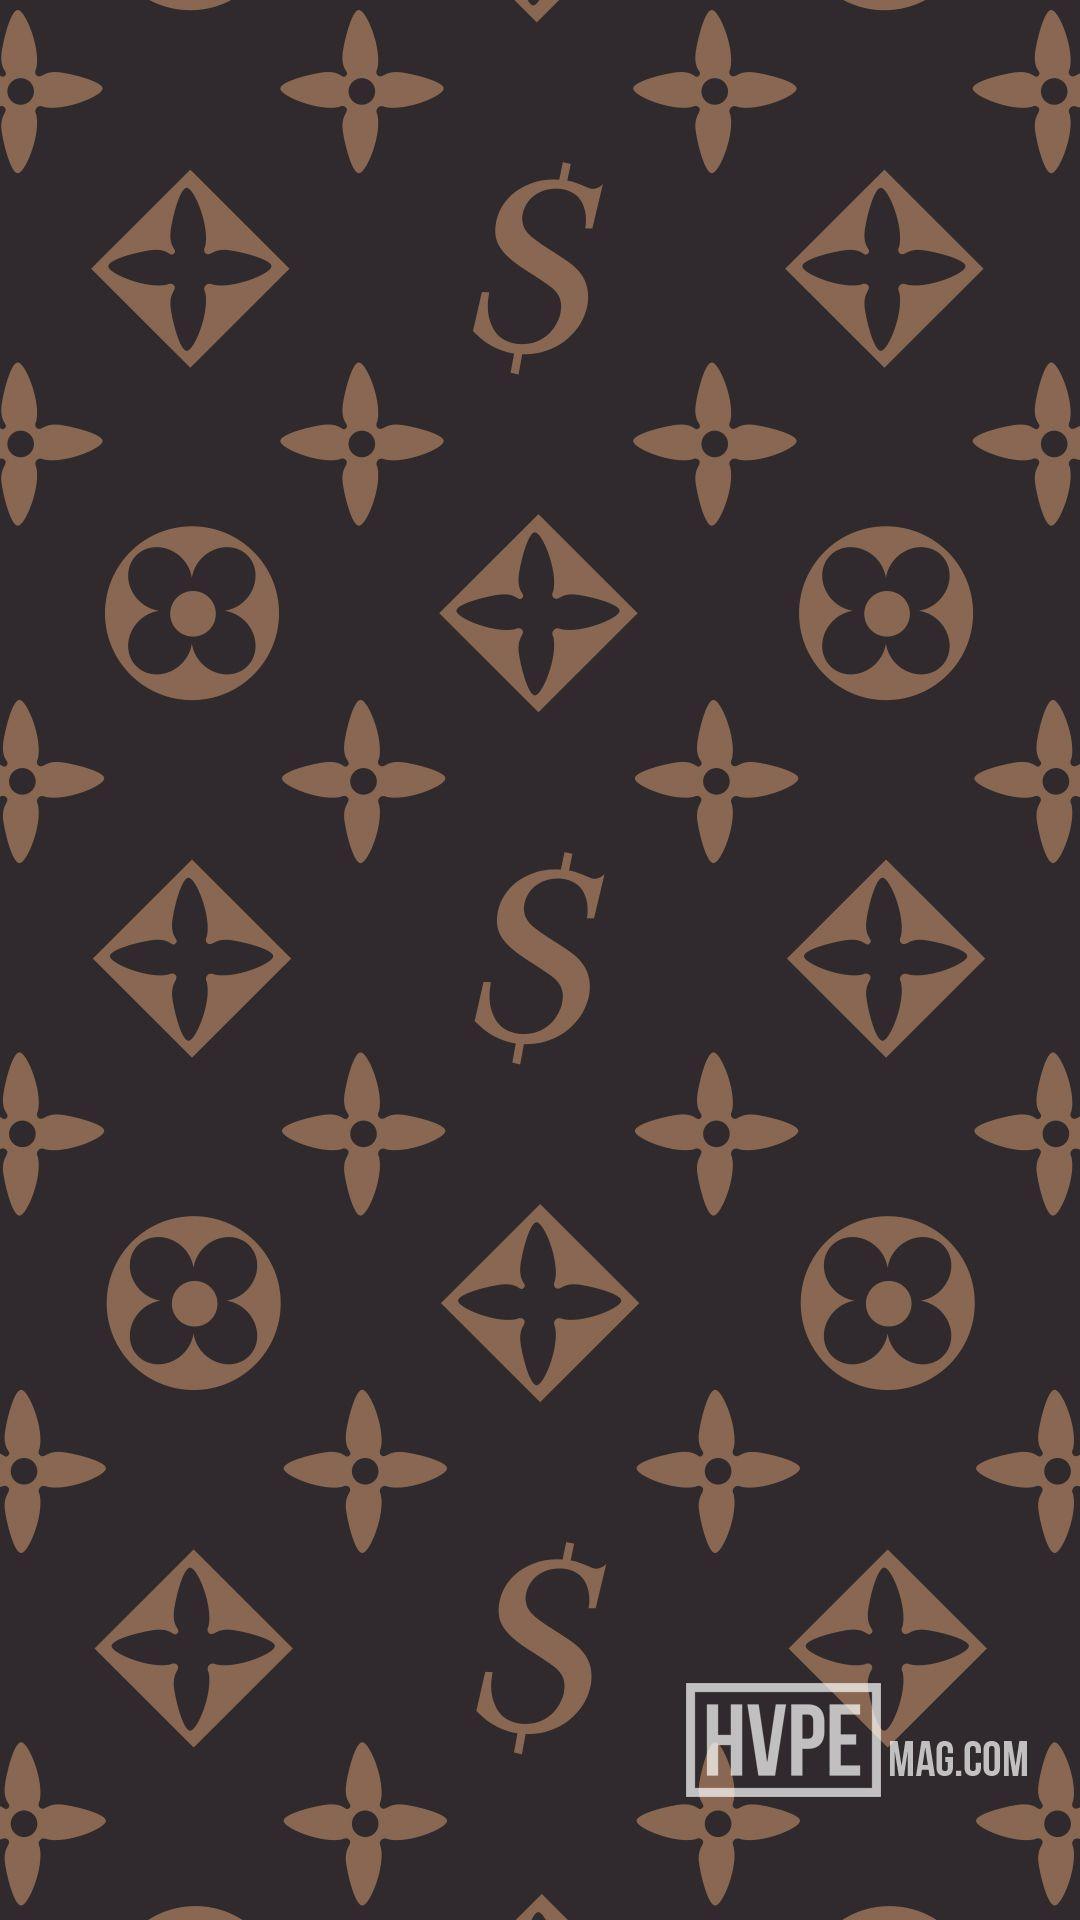 Supreme Louis Vuitton Wallpapers - Wallpaper Cave